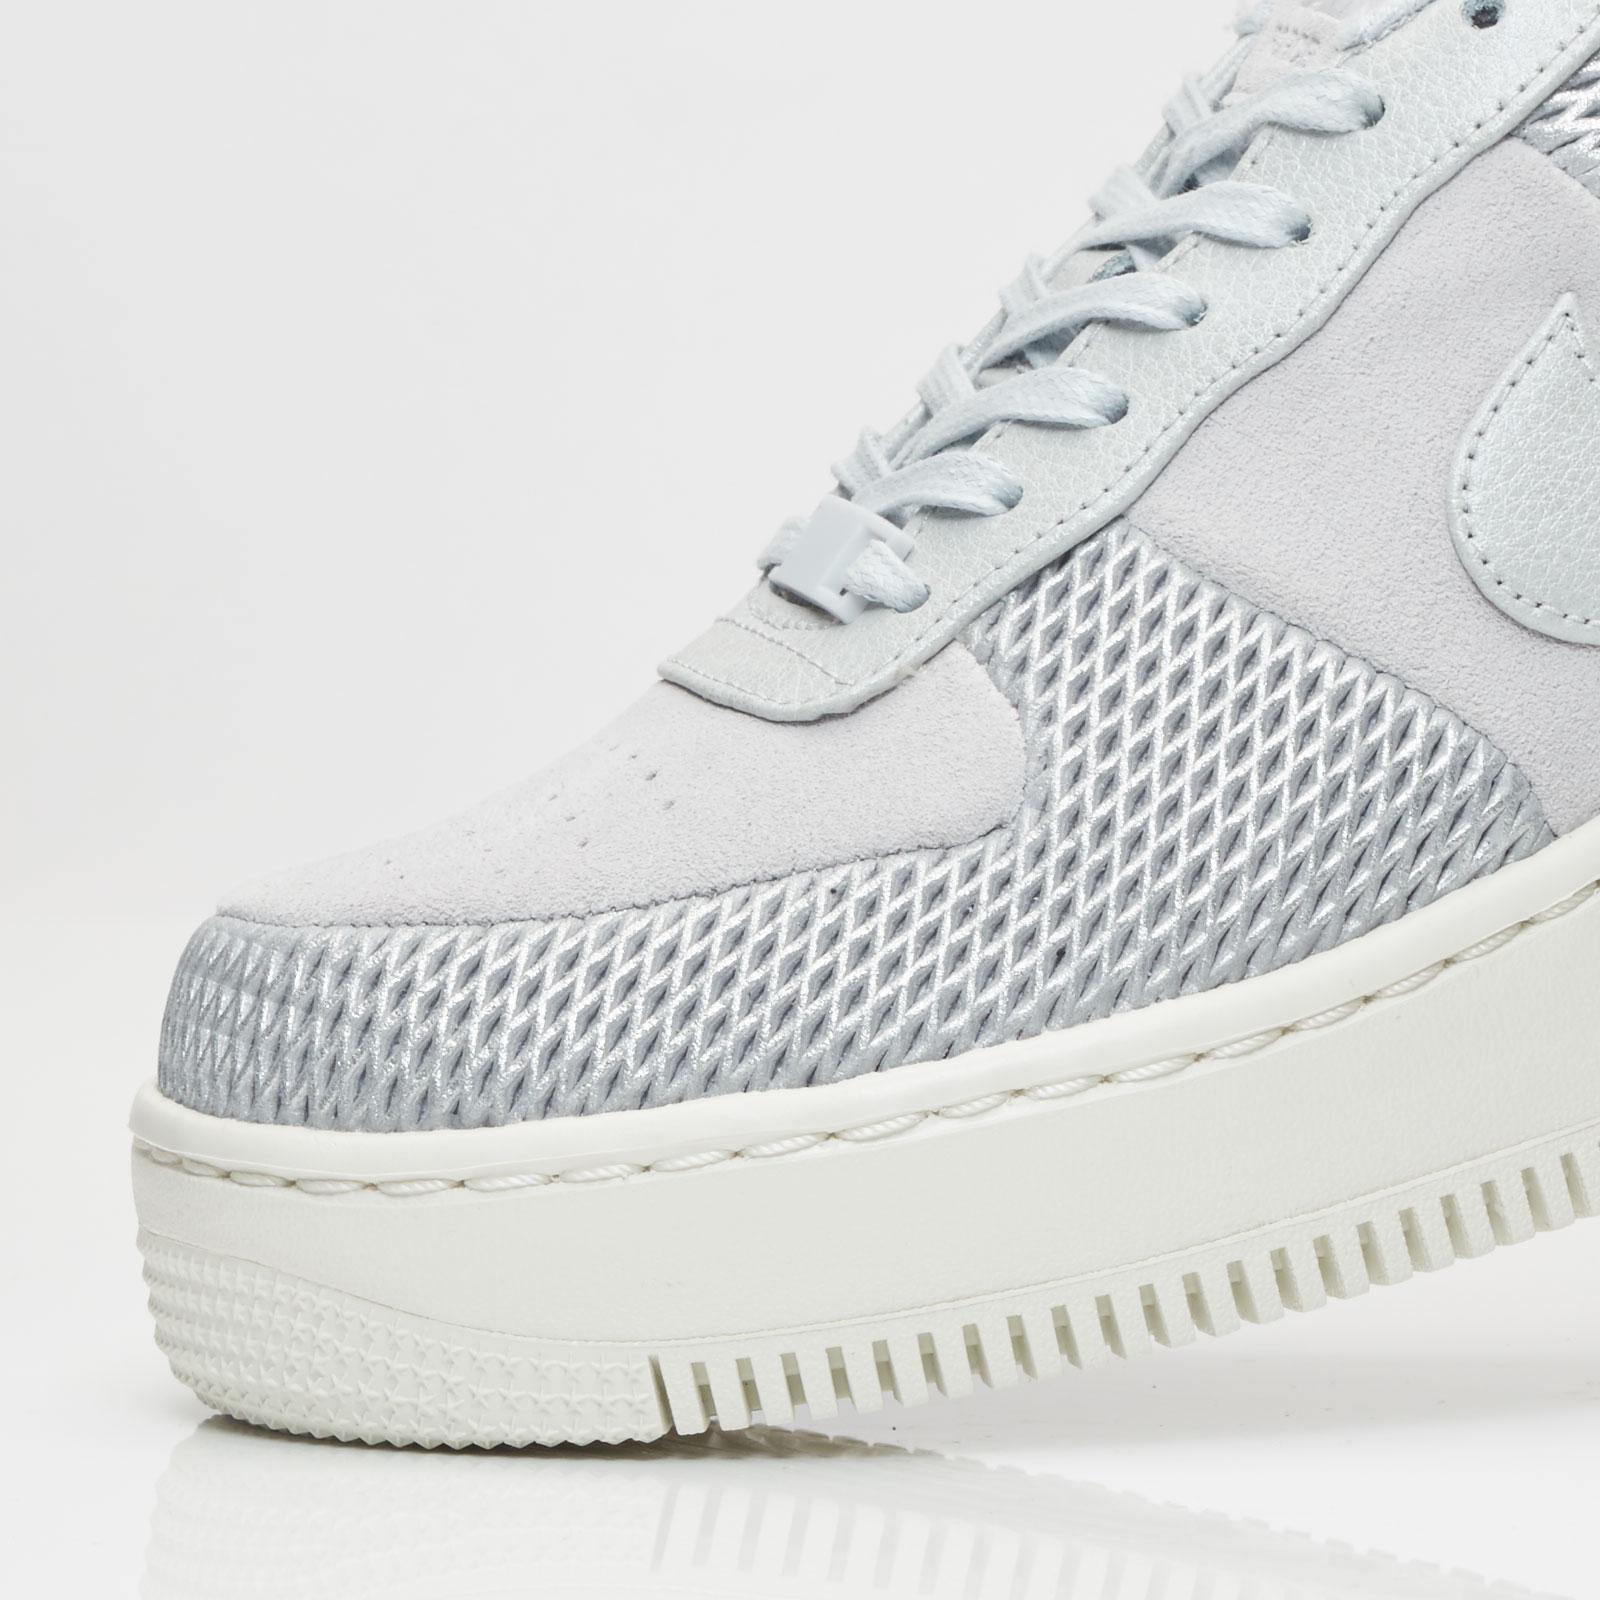 the best attitude 4eaaa 81980 ... Nike Sportswear Wmns Air Force 1 Upstep ...